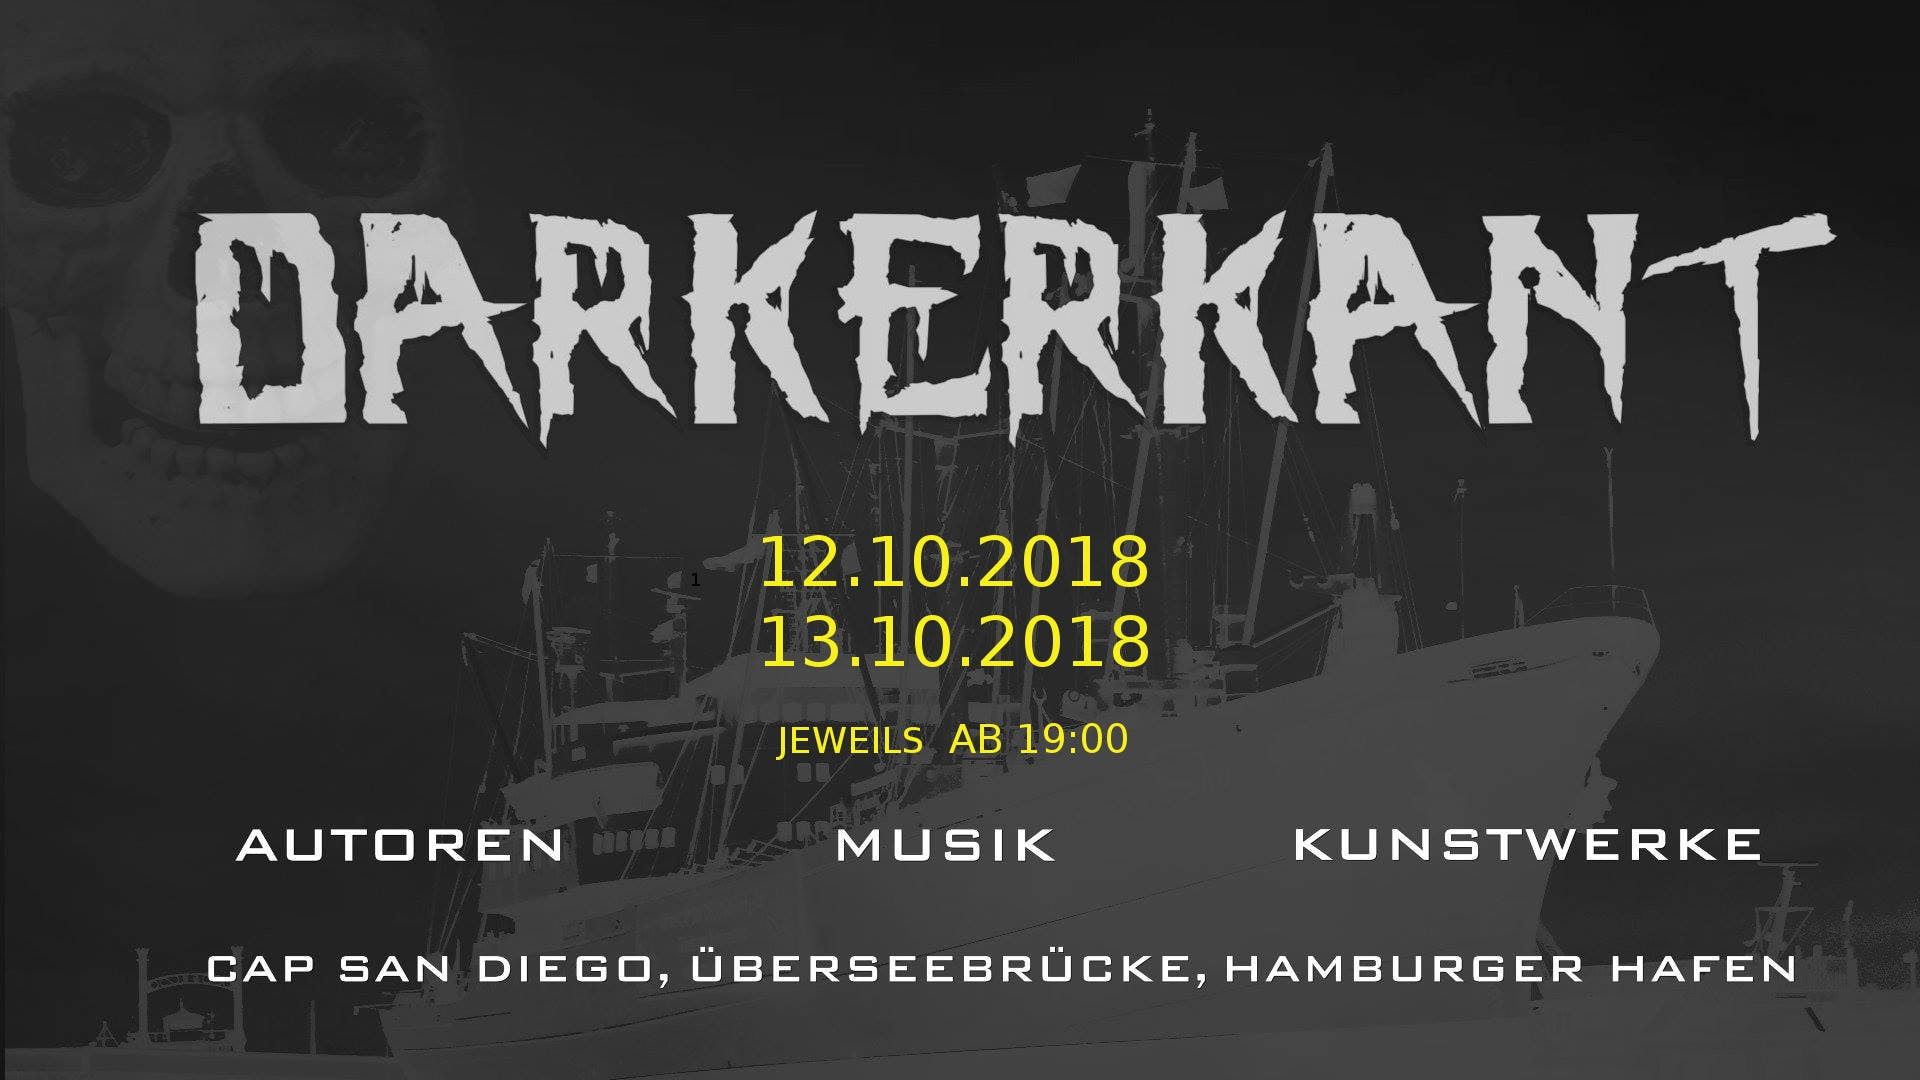 Darkerkant... - Hamburg - 13/10/18 - Evensi